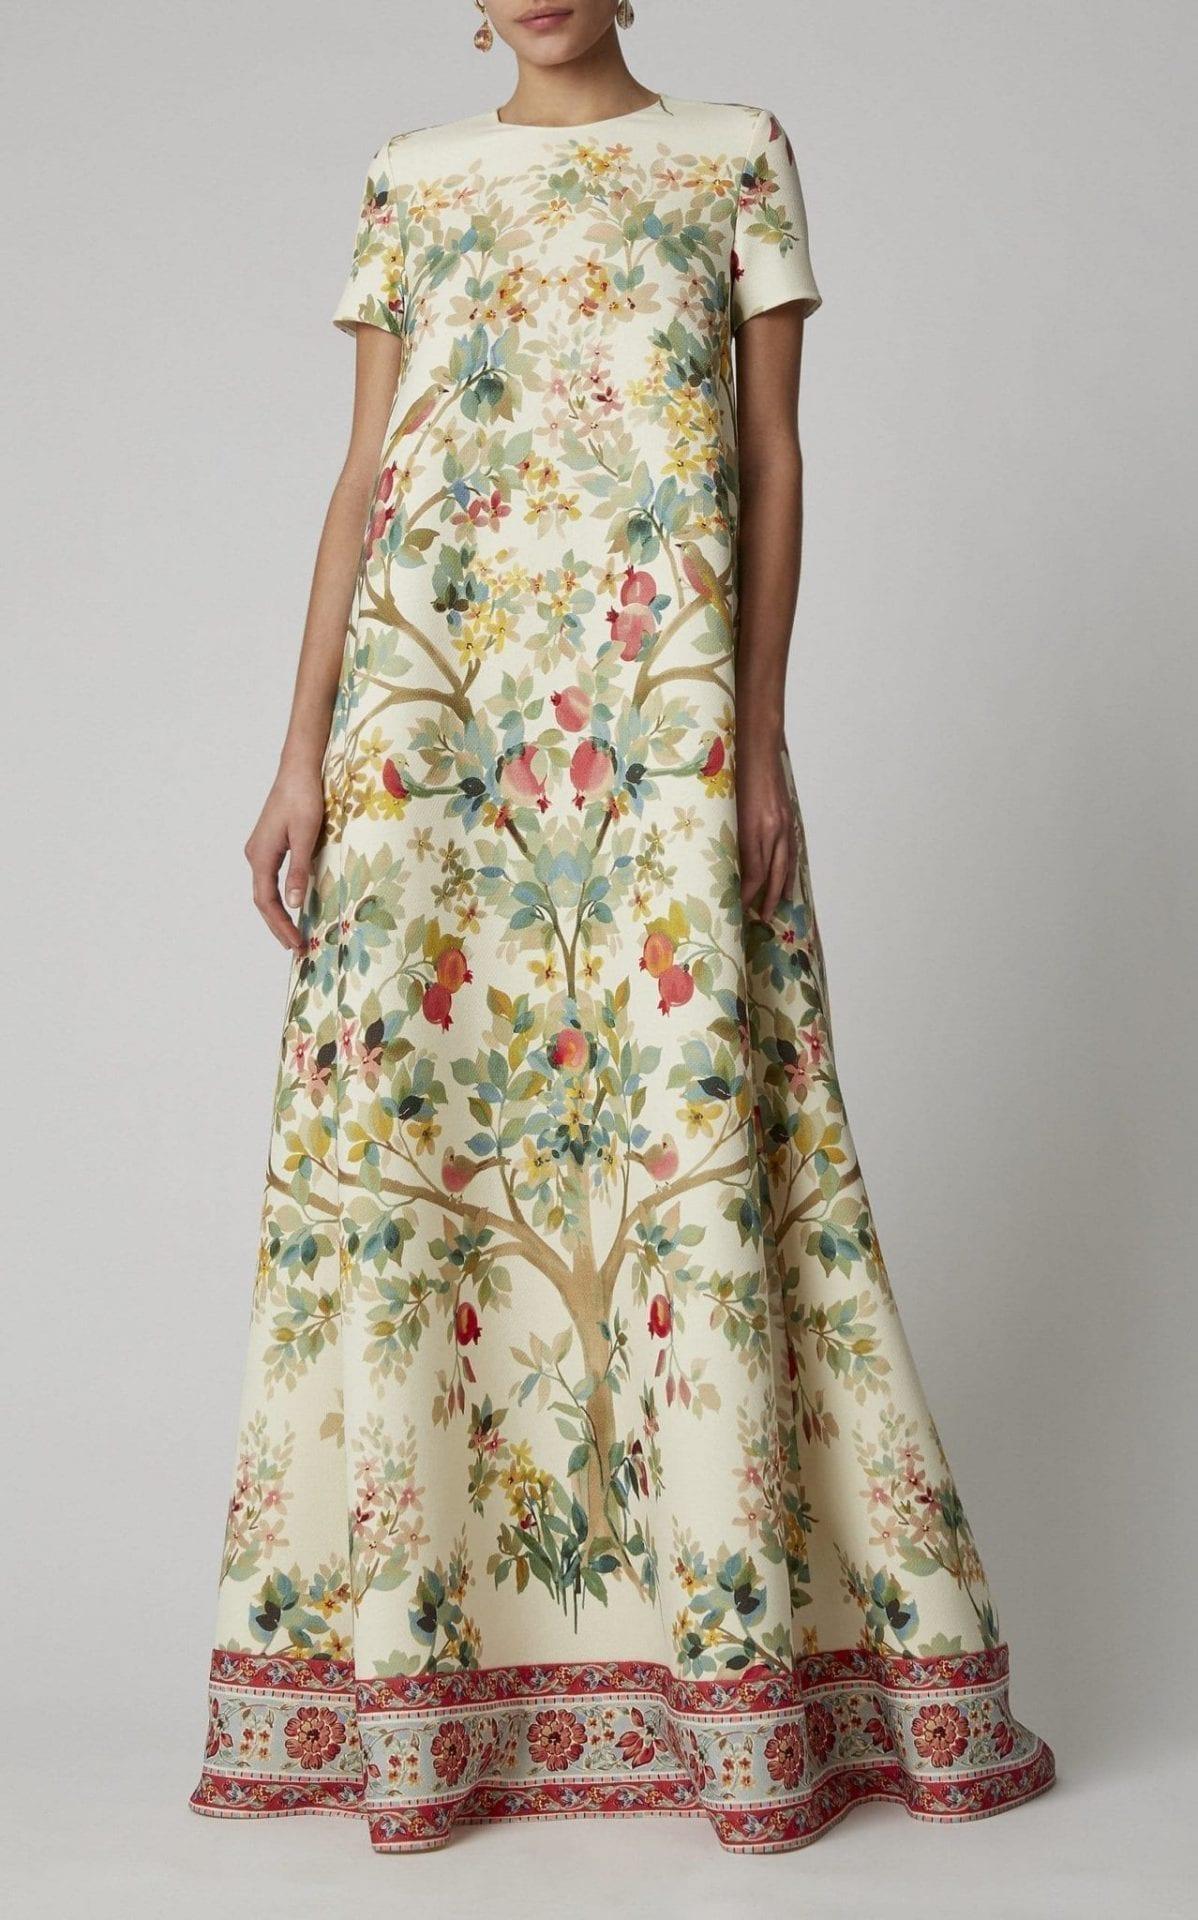 OSCAR DE LA RENTA Floral-Print Wool Gown